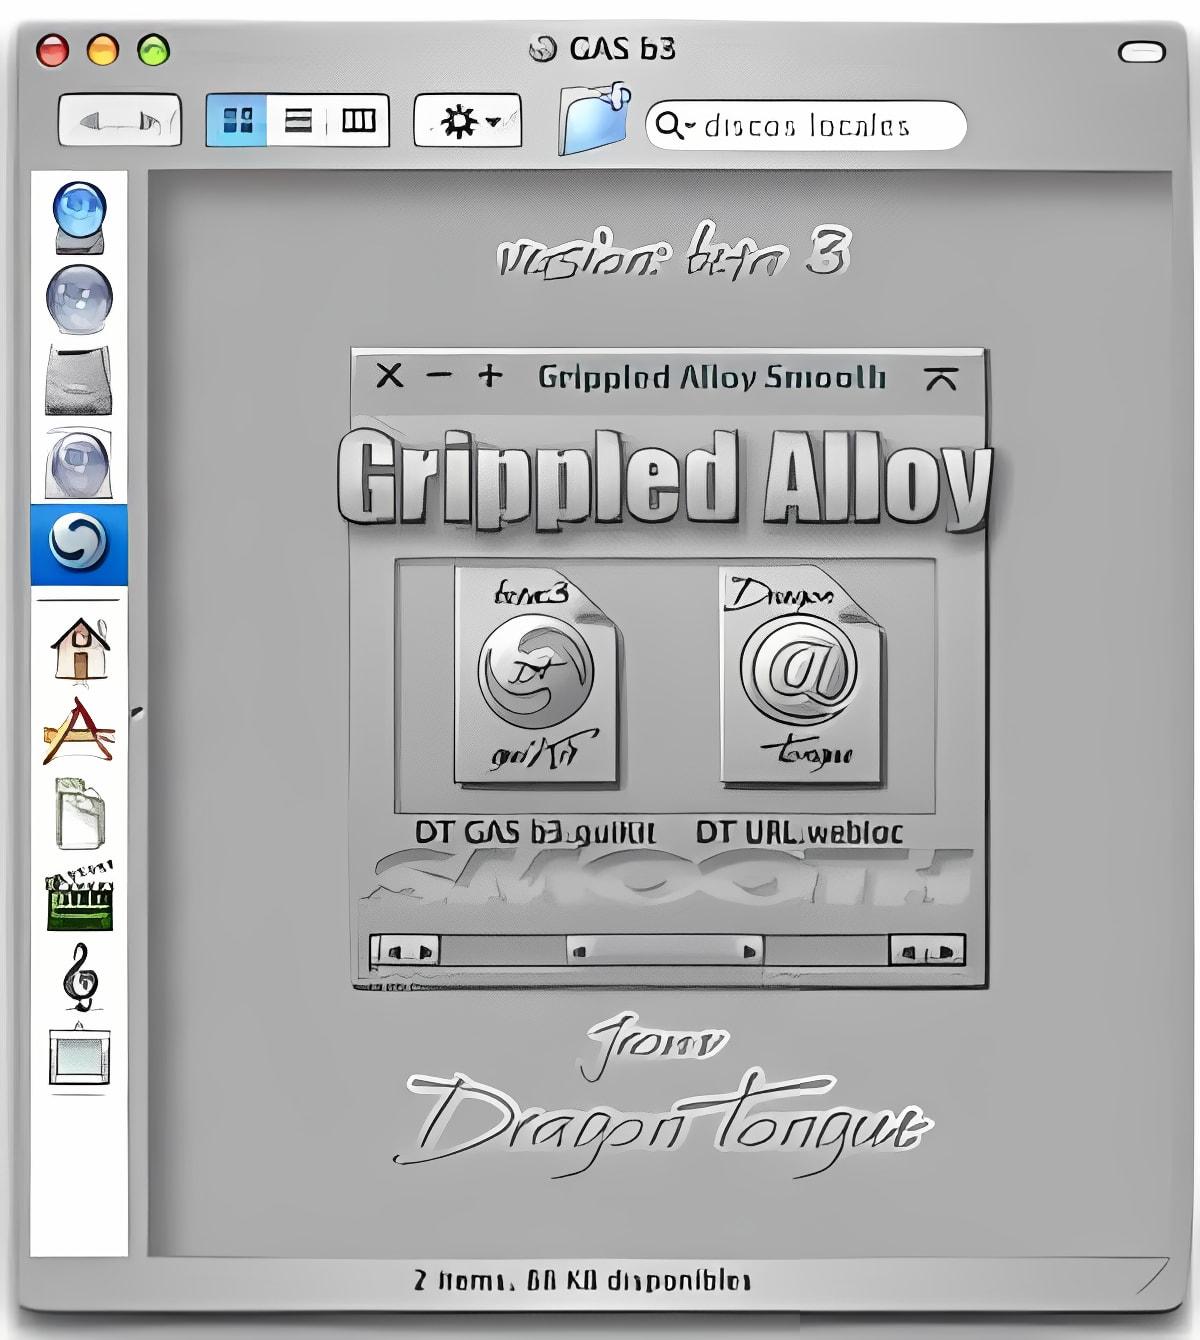 DT Grippled Alloy Smooth